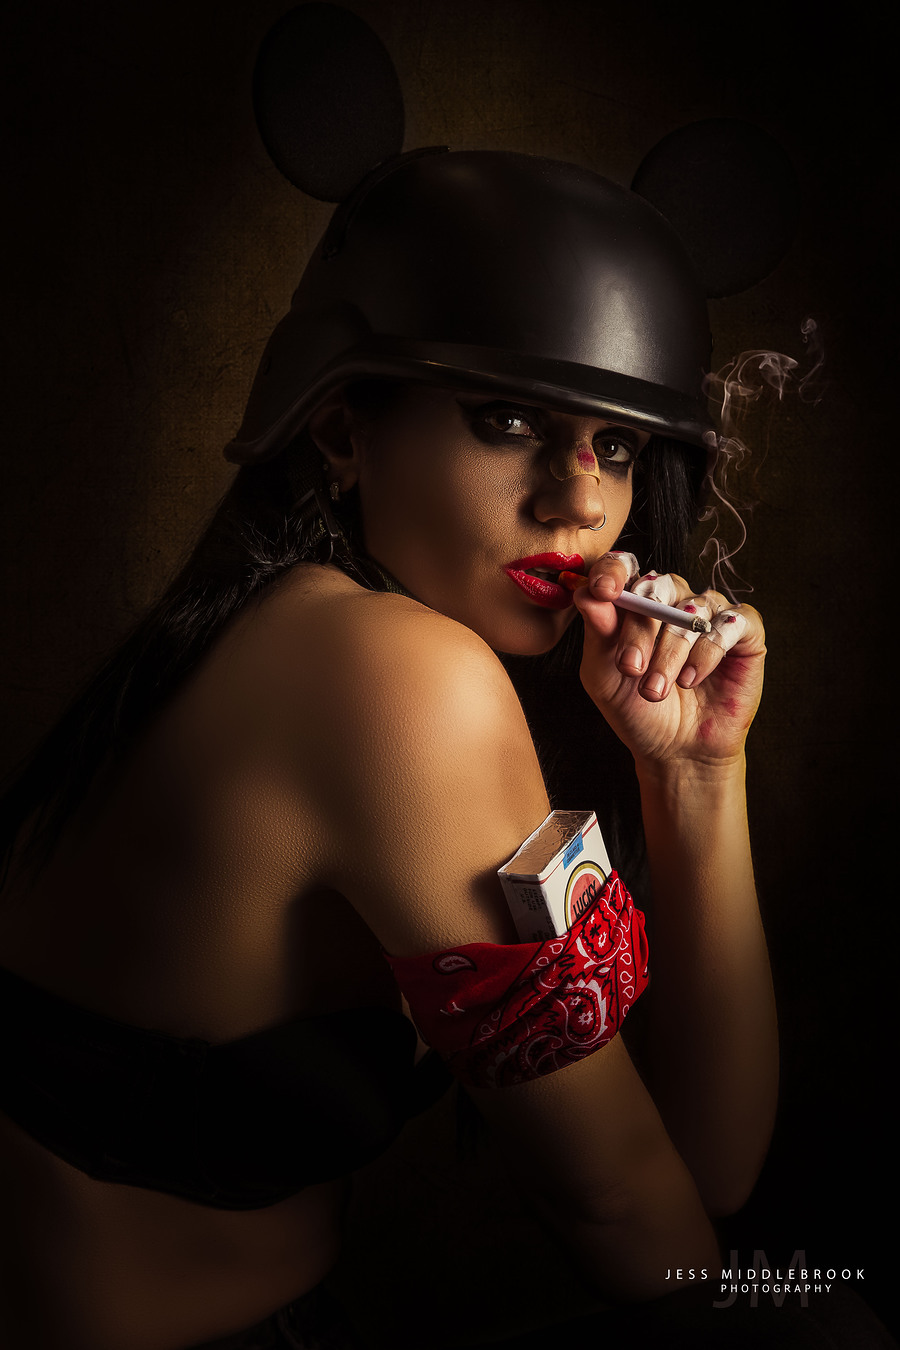 Smoke? / Photography by Jess Middlebrook, Model Lilly Von Pink, Makeup by The velvet unicorn / Uploaded 11th November 2017 @ 04:02 PM